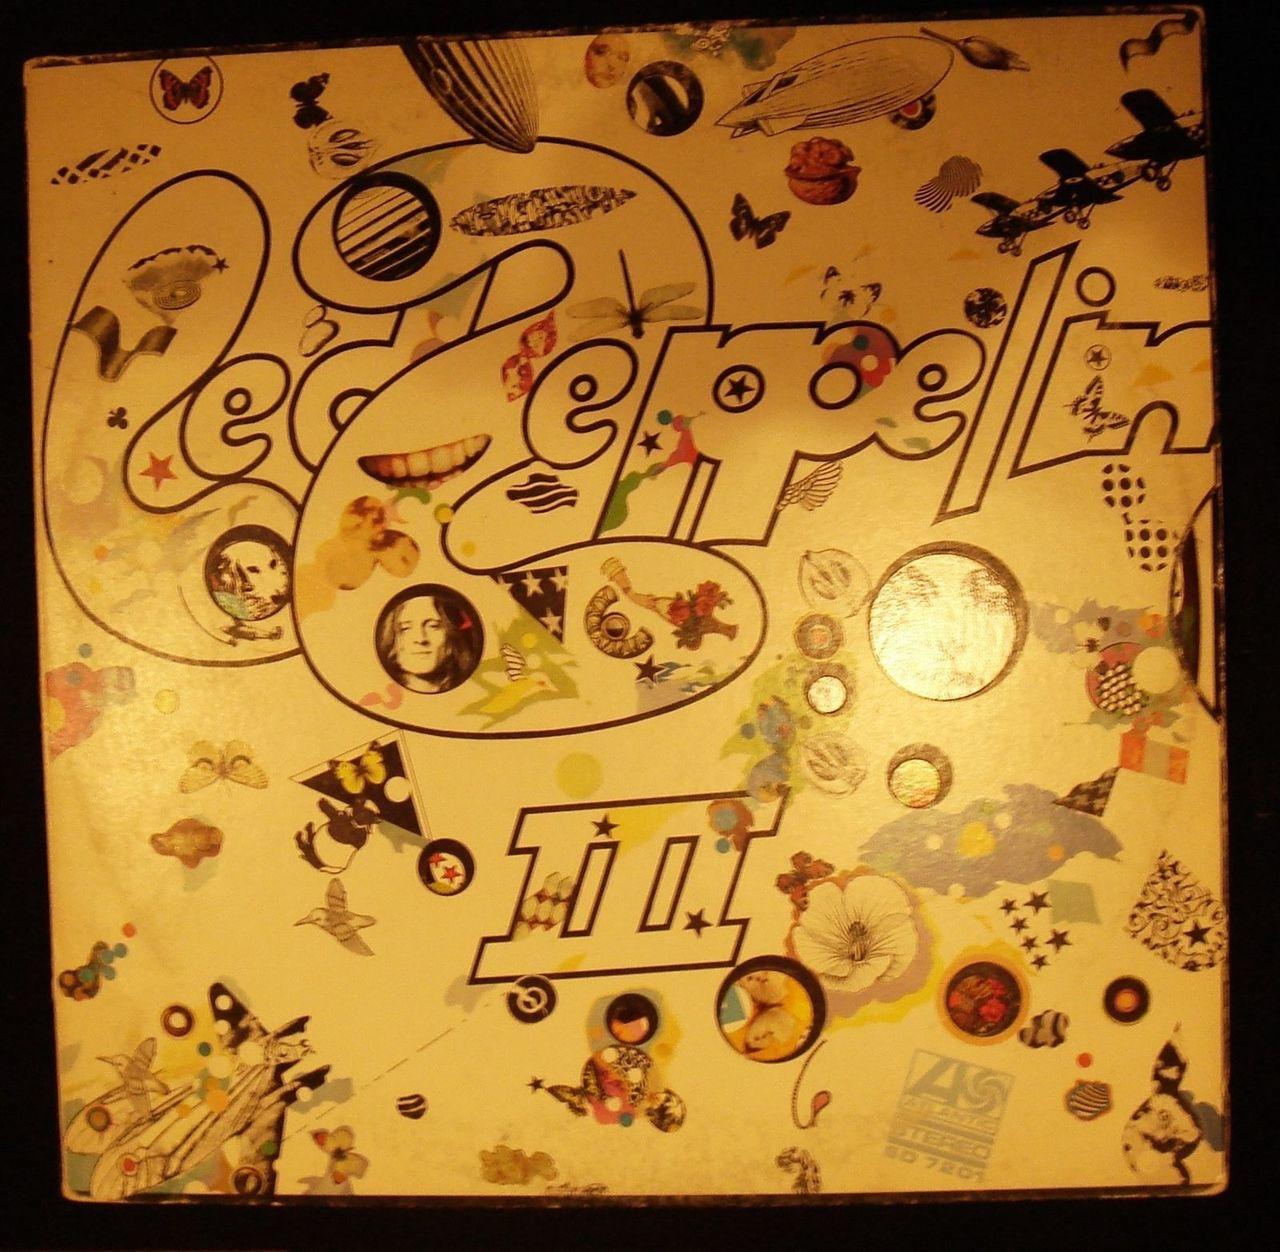 LP: Led Zeppelin III - 1970